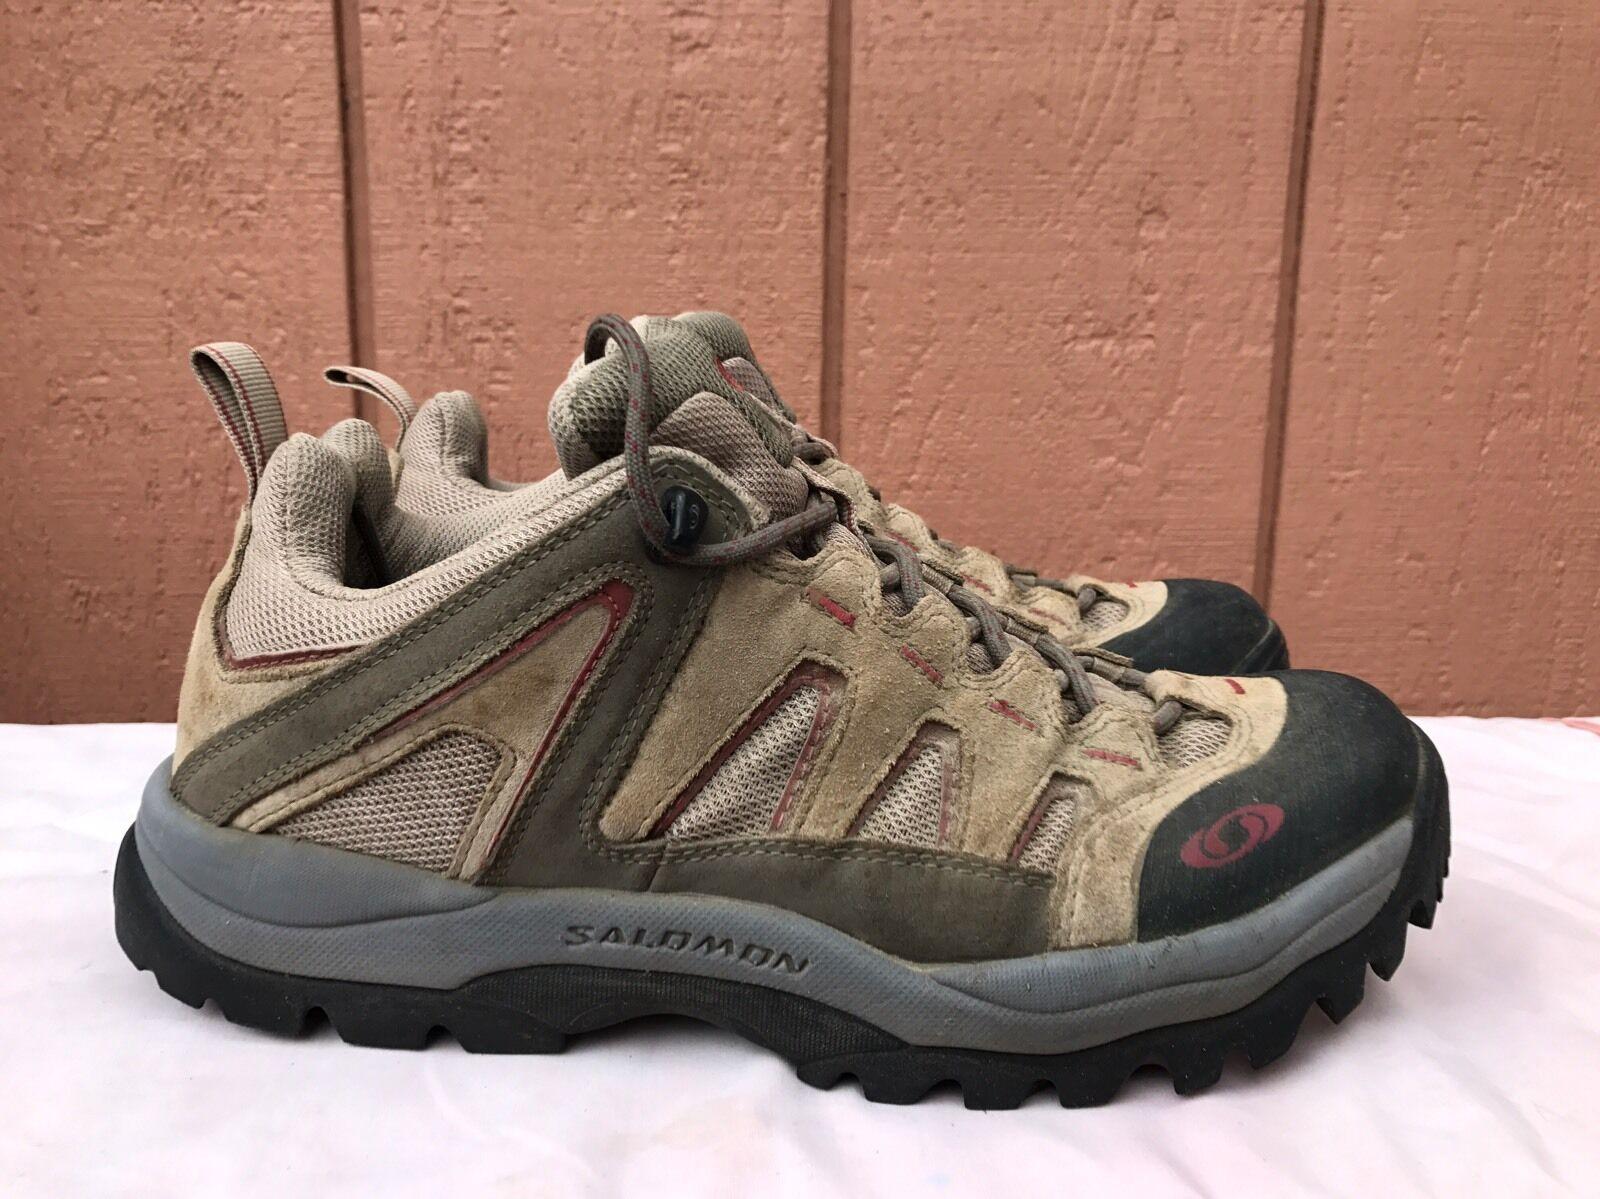 EUC Salomon Solaris Low Brown Leather Hiking Boots Women US 9  3